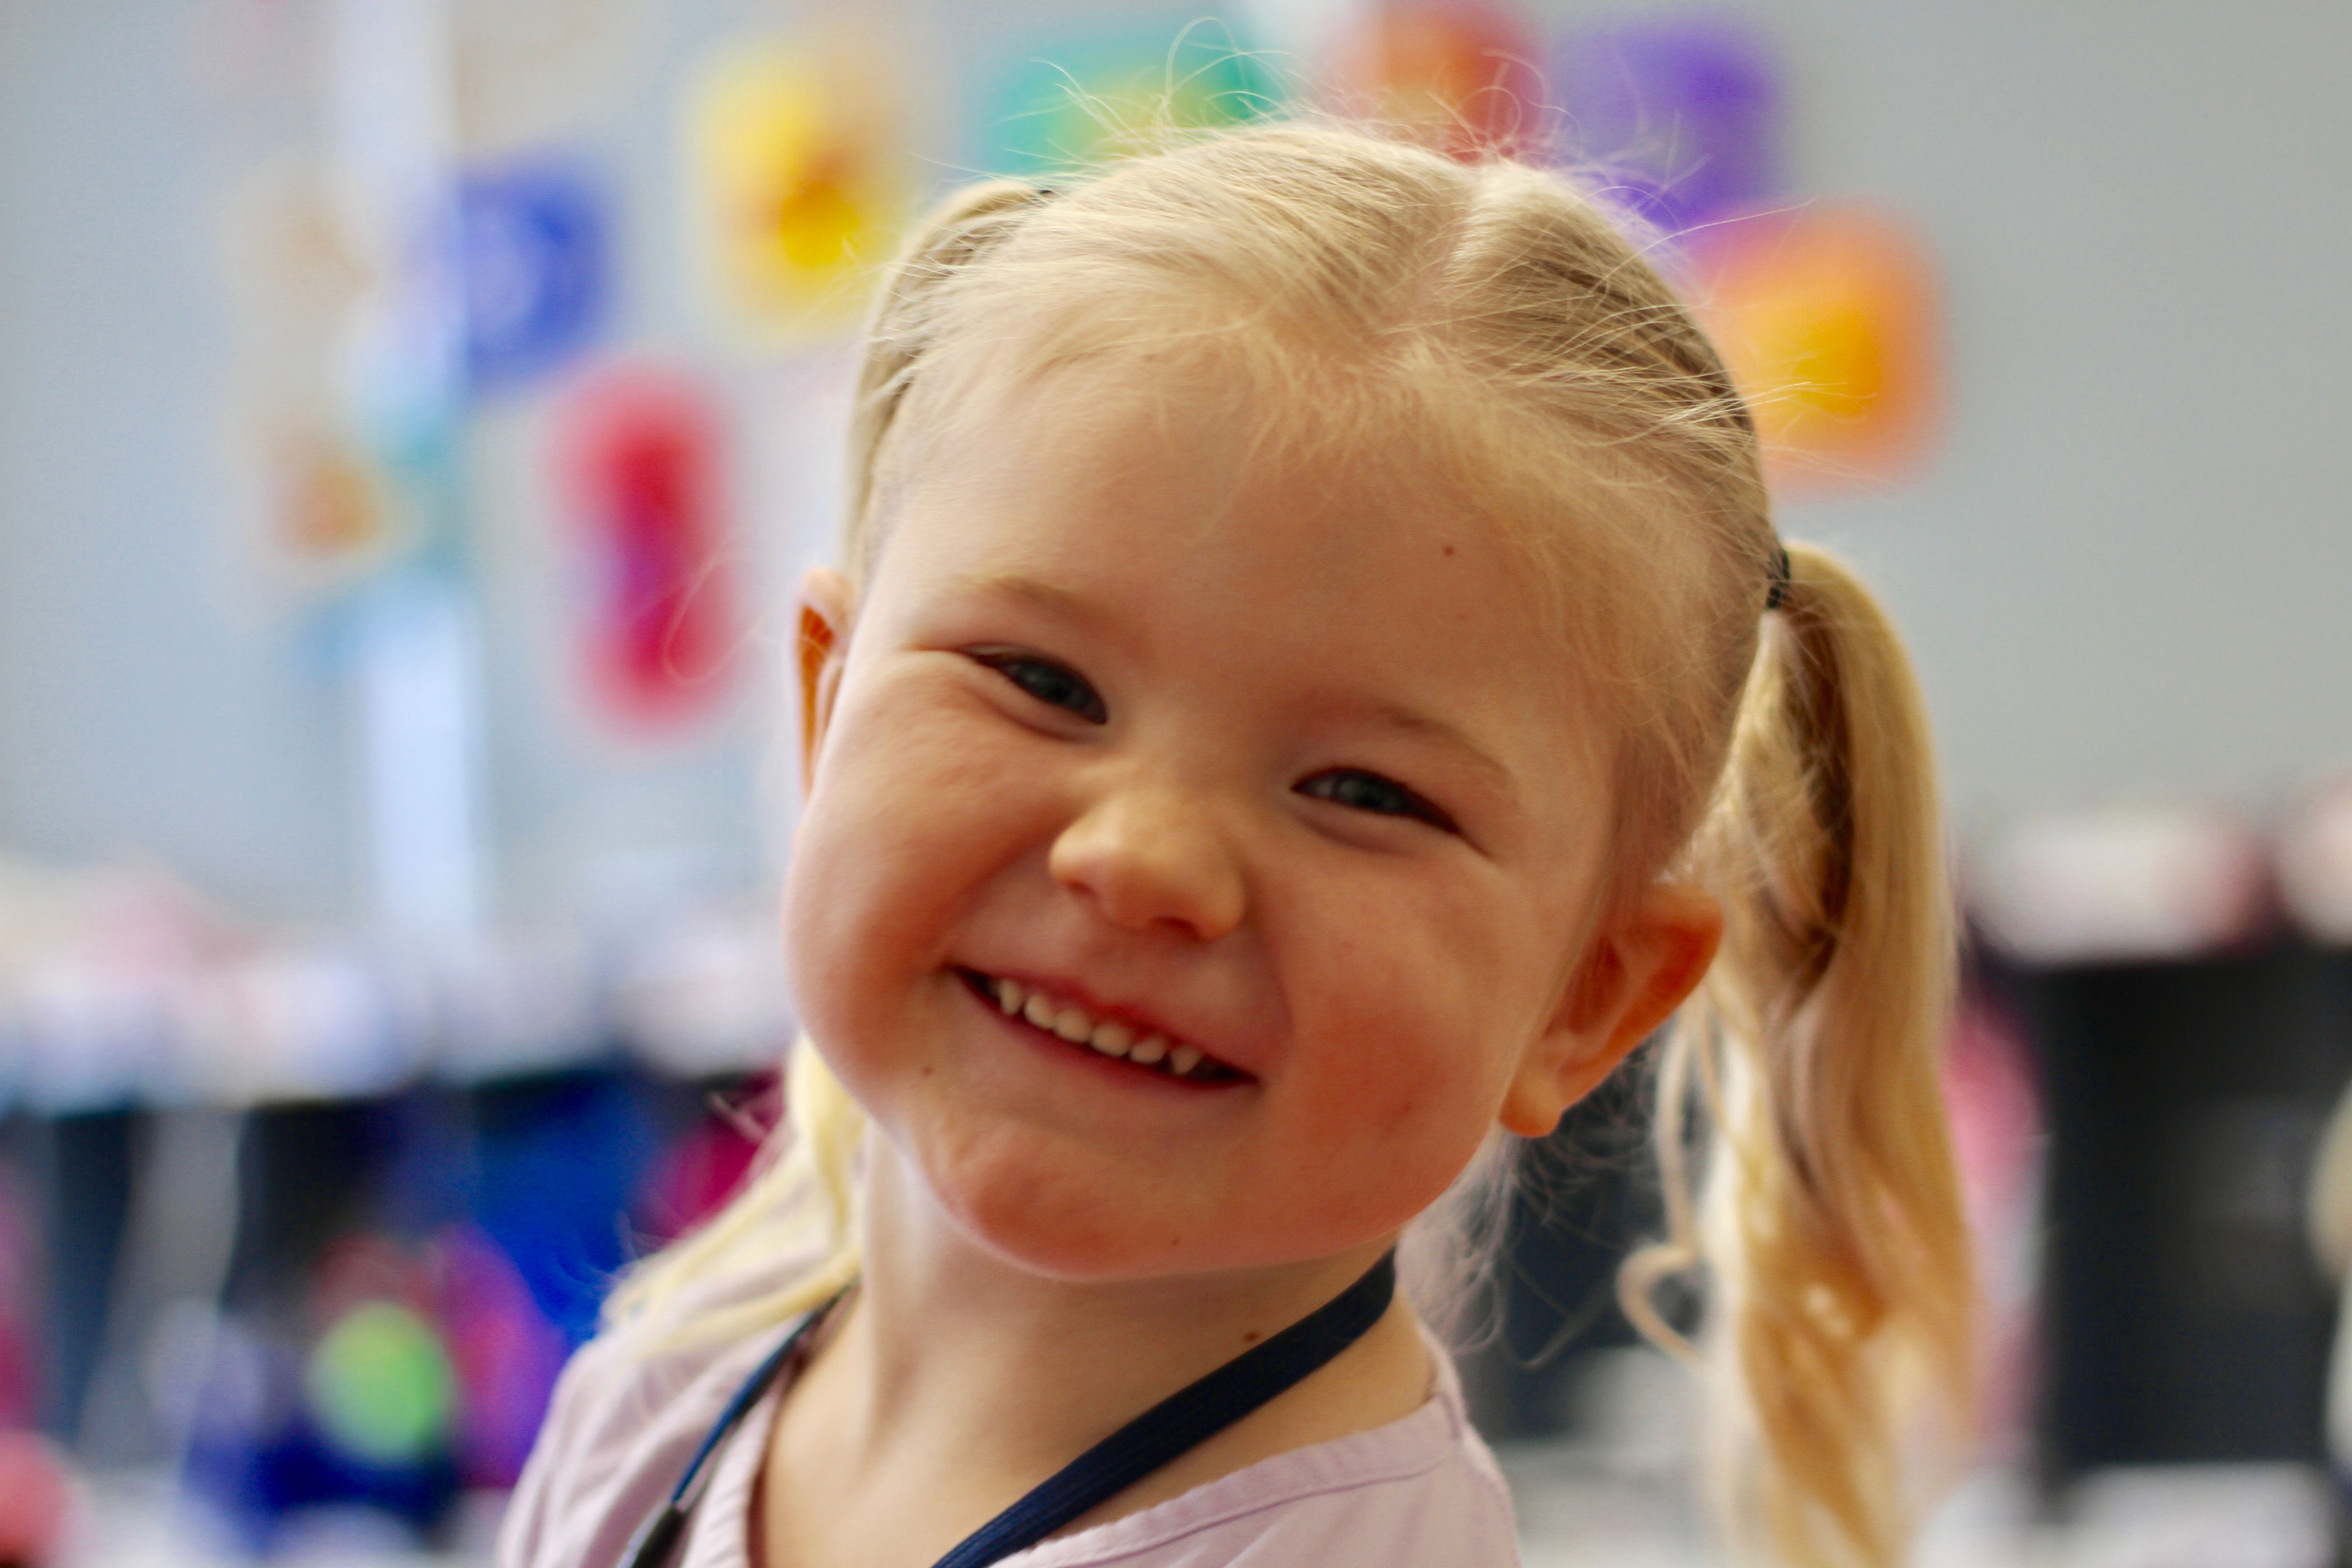 Can You Predict the Future of a Preschooler?